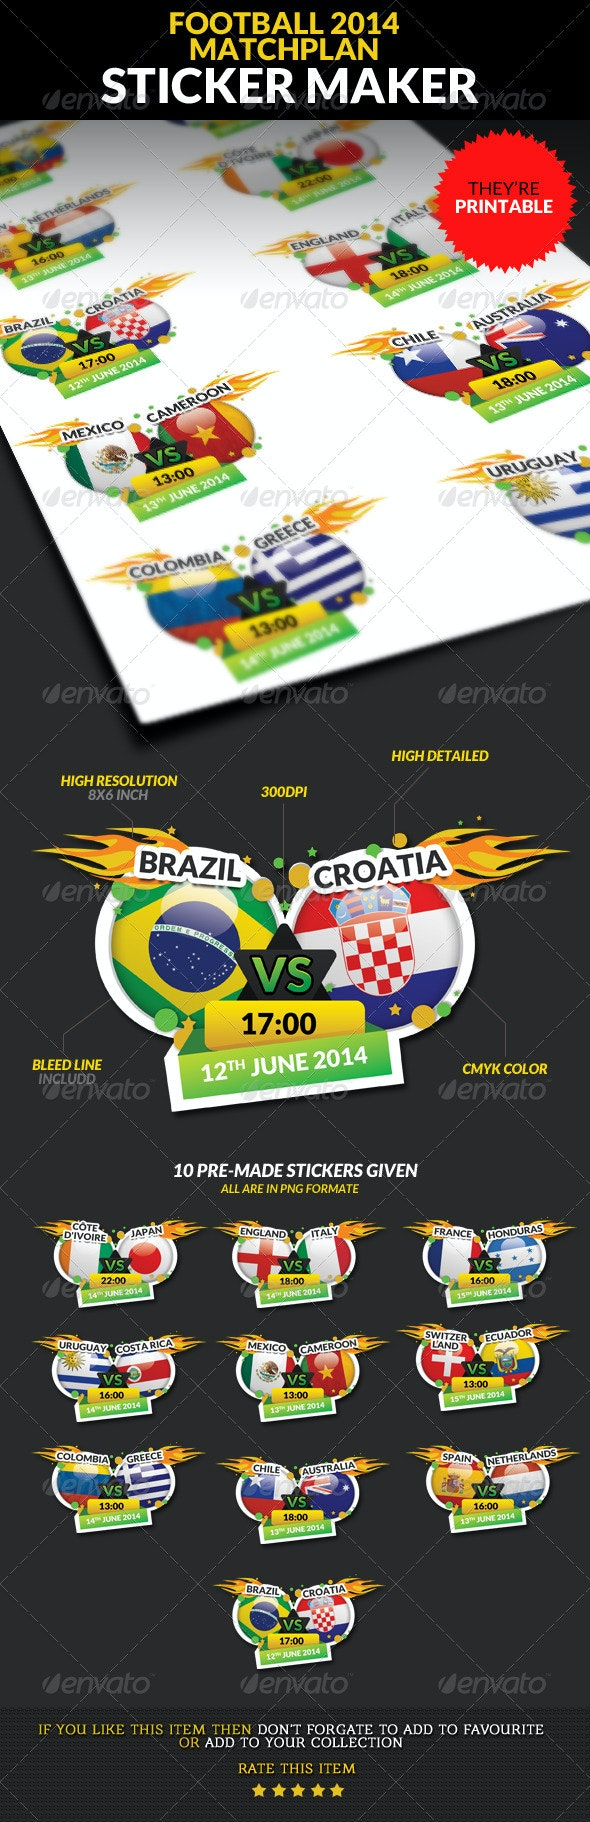 Football Championship 2014 Matchplan Sticker Maker - Badges & Stickers Web Elements